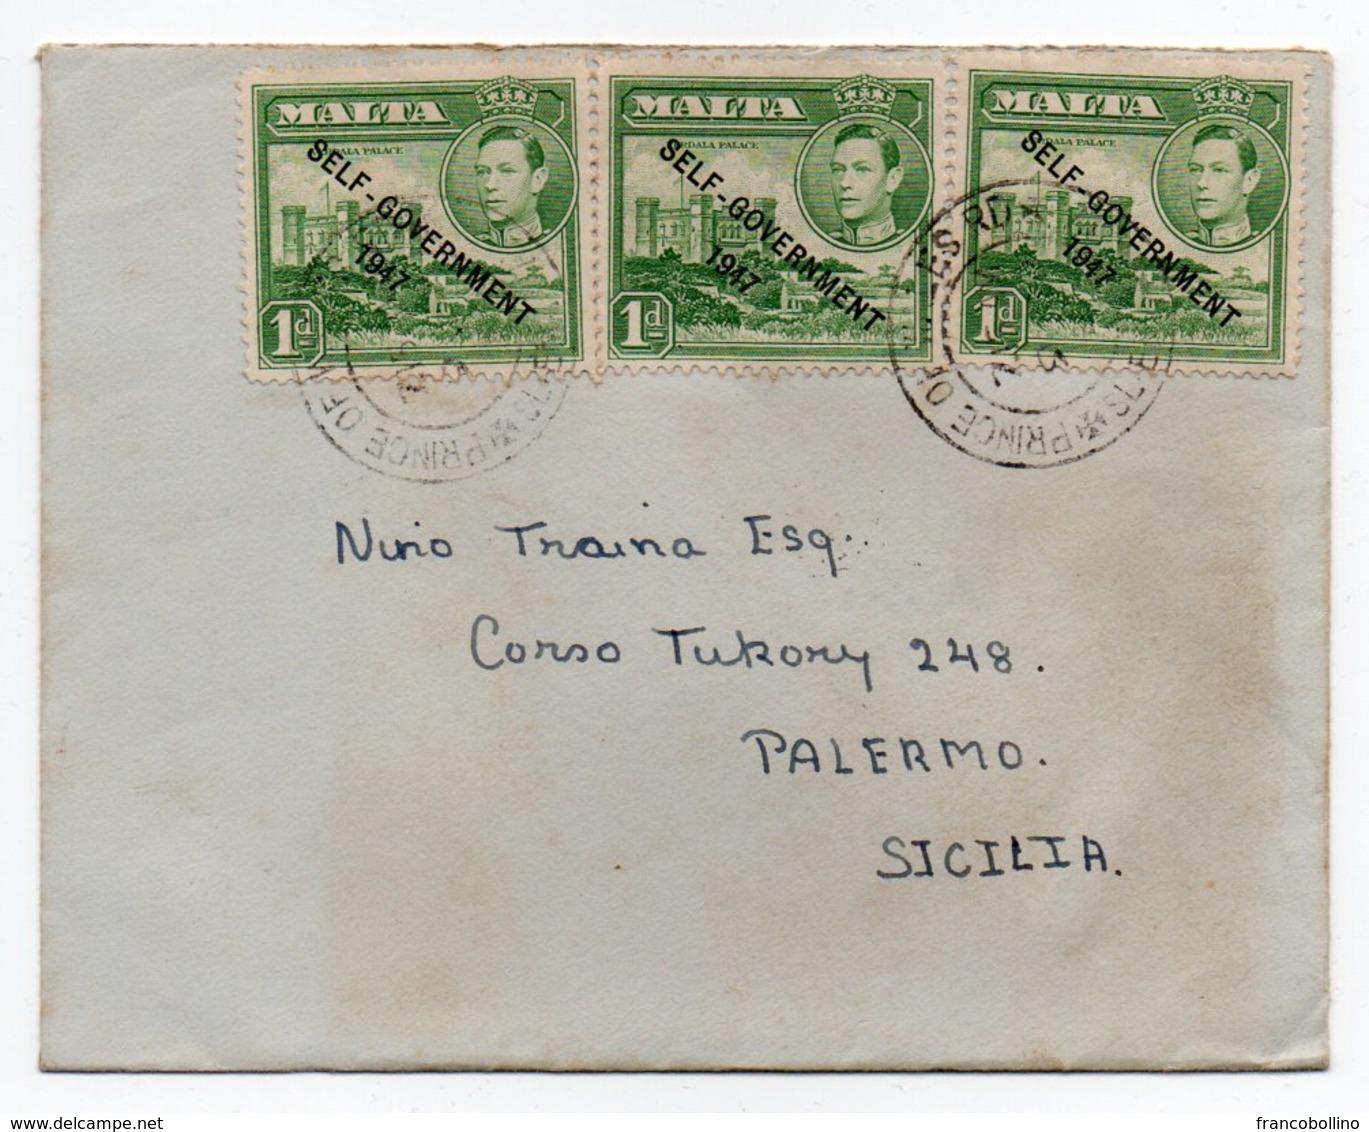 MALTA - COVER TO ITALY - 1950 / GEORGE VI STAMPS OVERPRINT SELF-GOVERNMENT 1947 - Malta